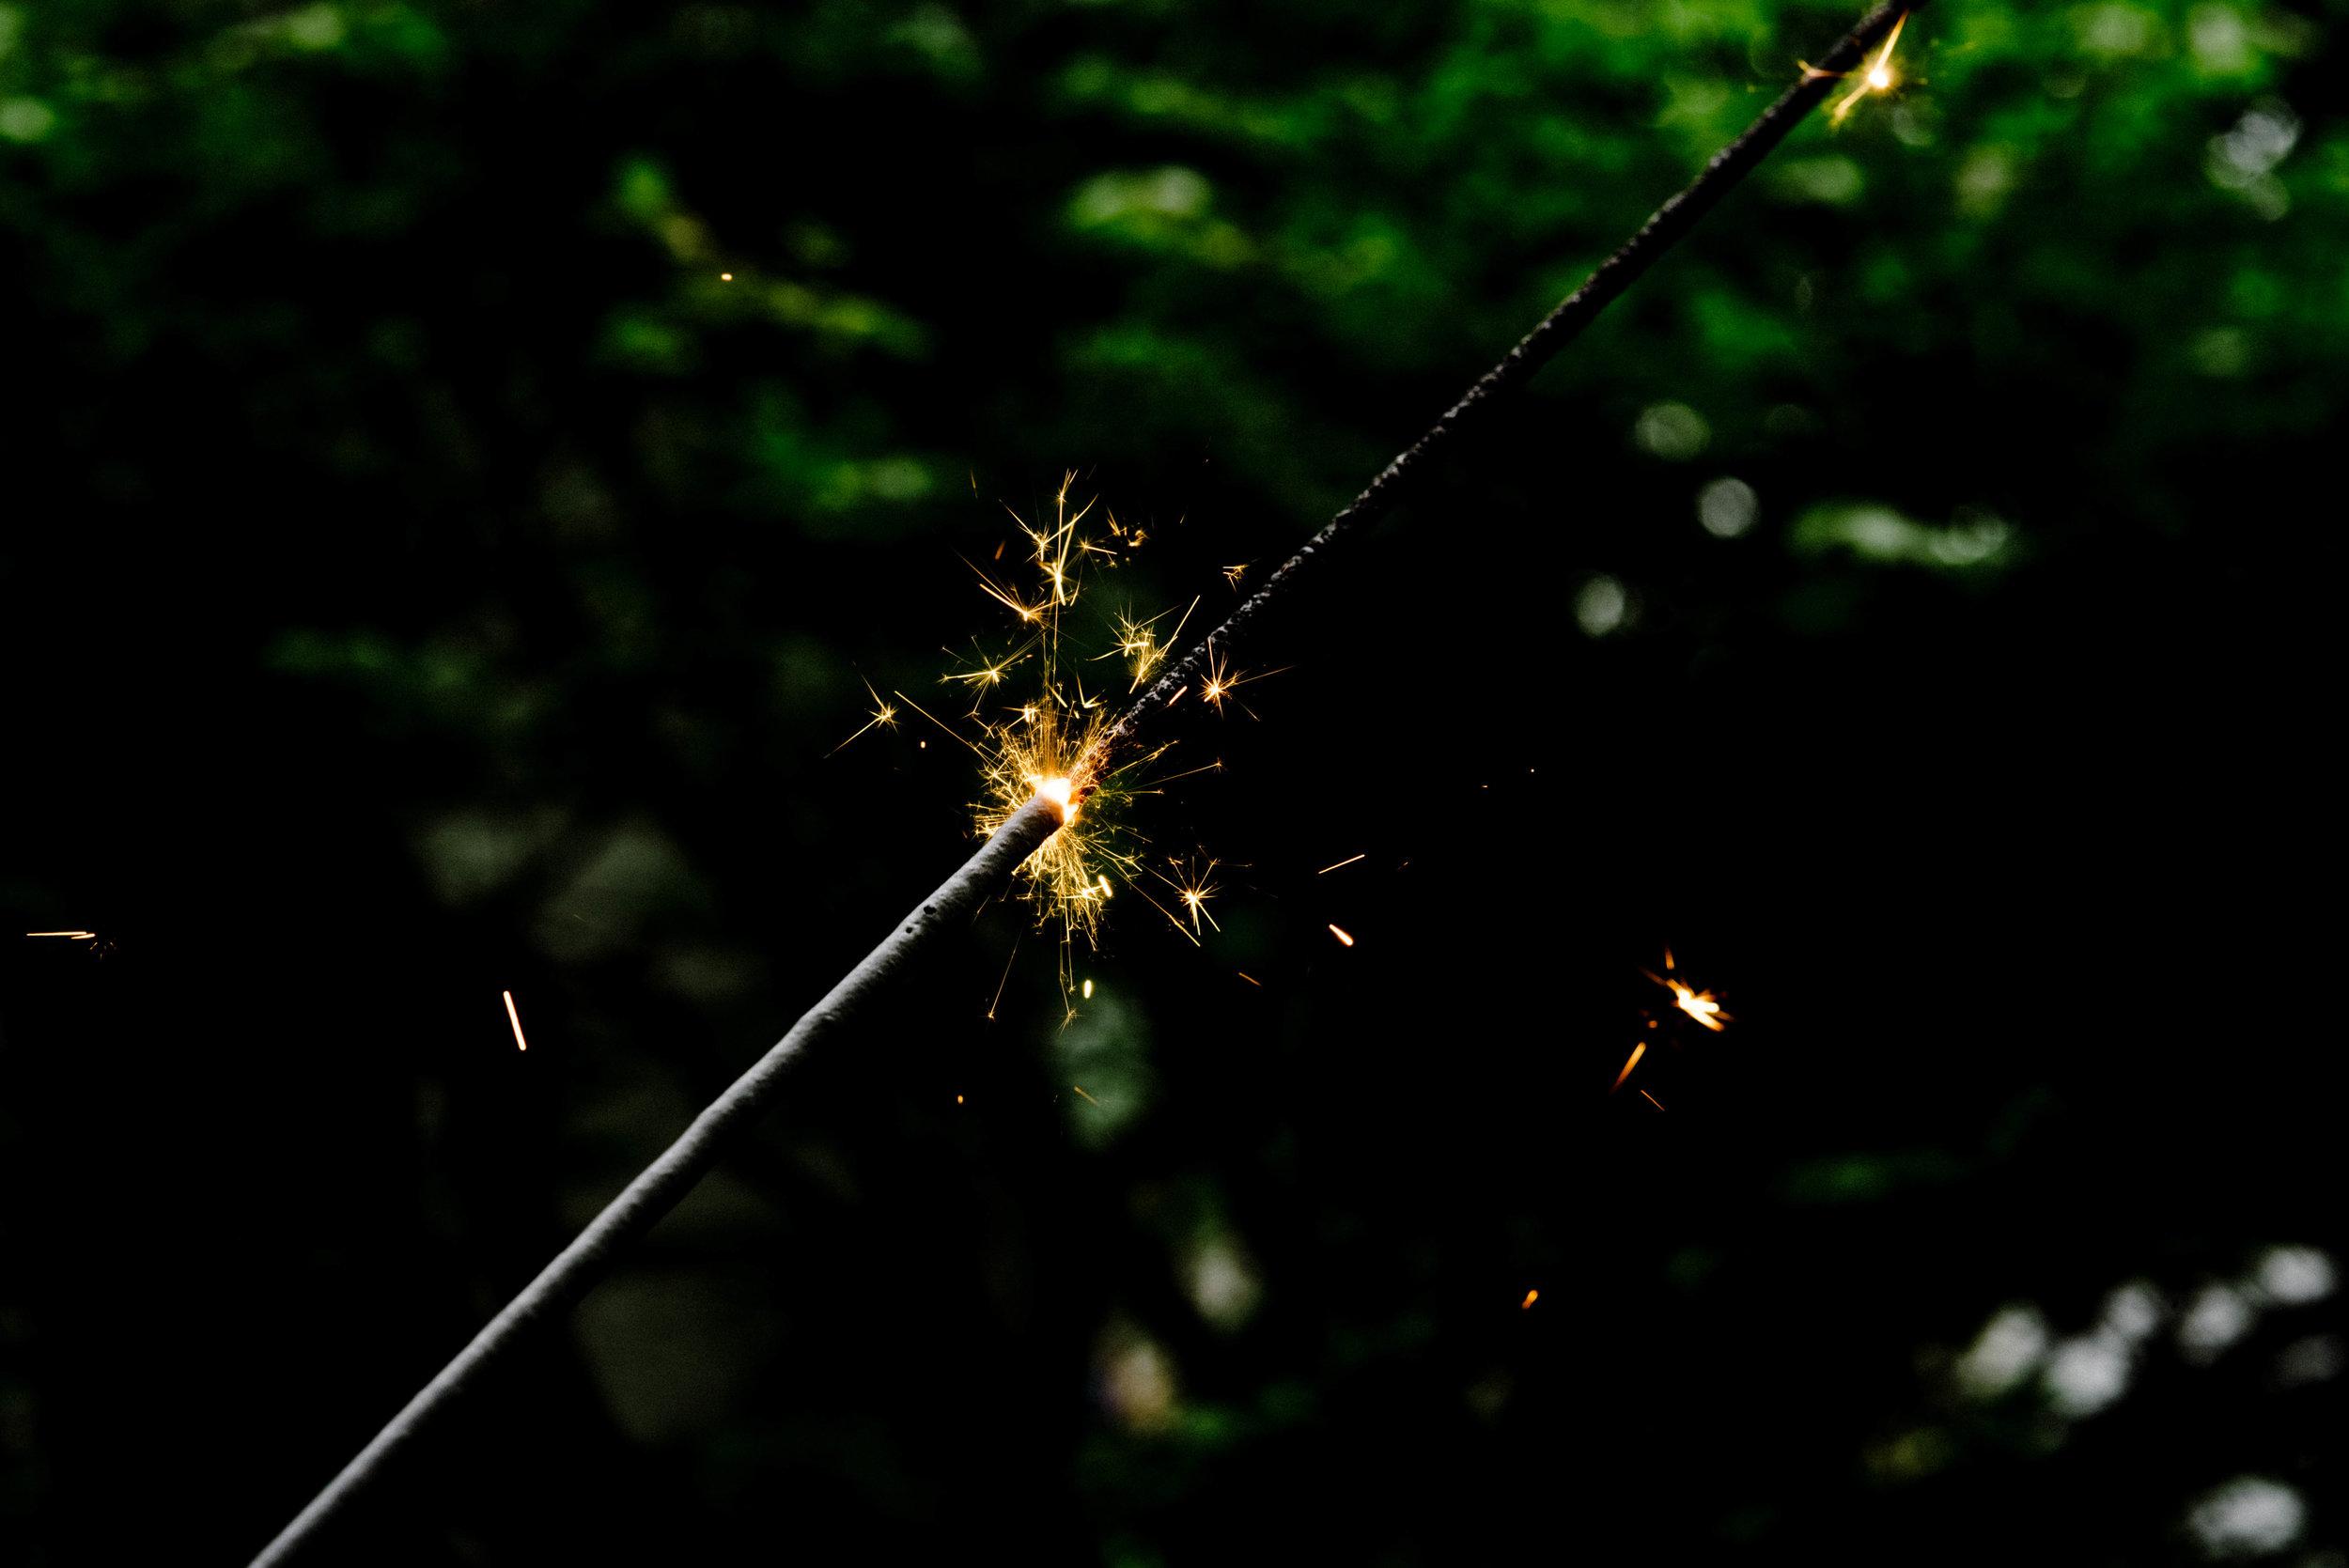 Fireworks-1-8.jpg